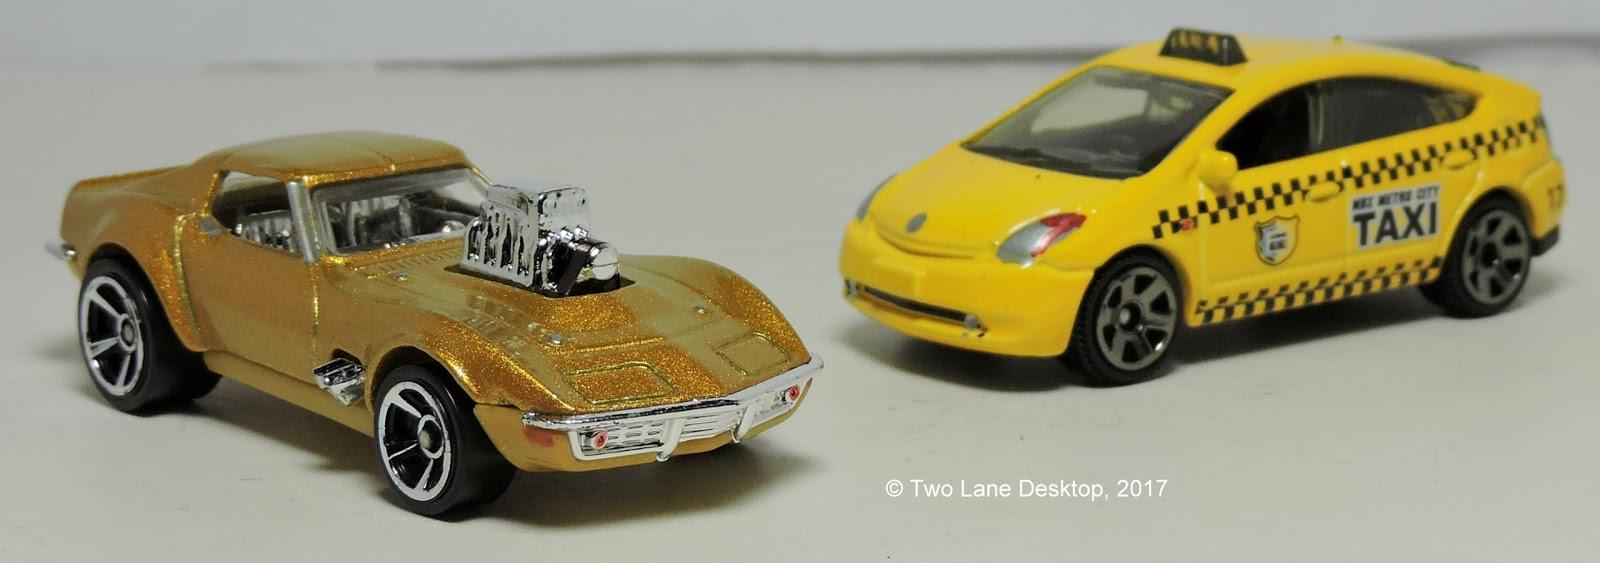 Hot Wheels Gas Monkey Garage 1968 Corvette And Matchbox Toyota Prius Taxi